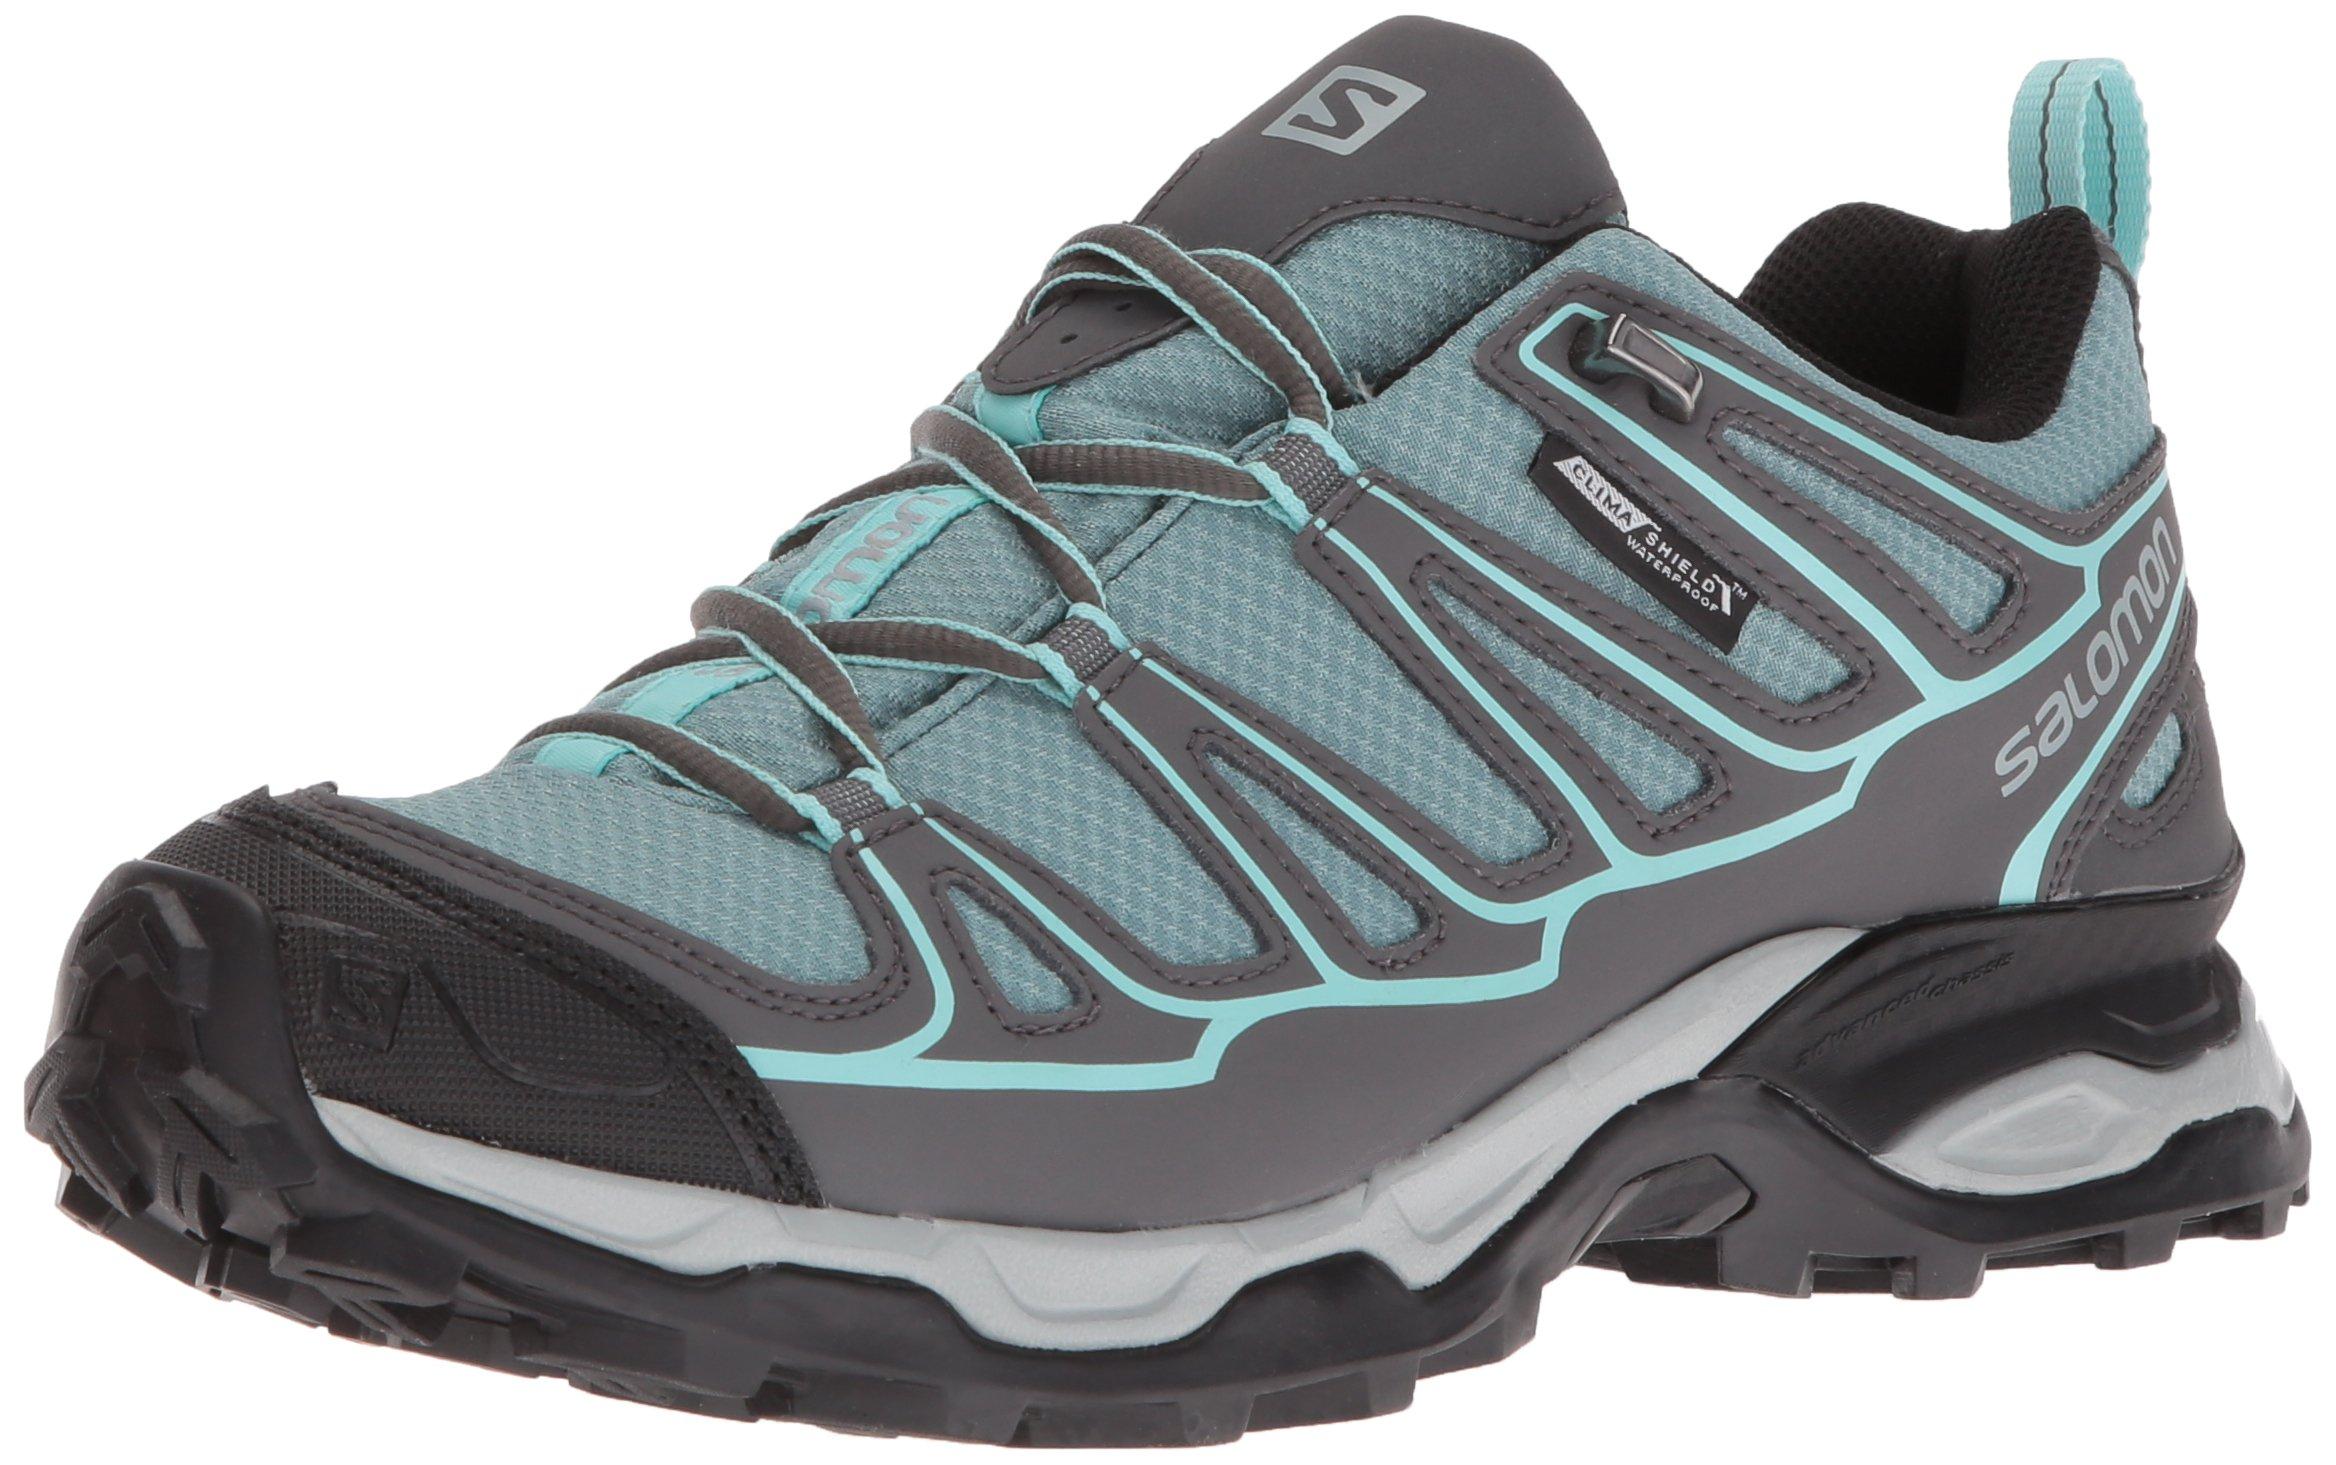 816Qlpp53GL - SALOMON Women's Hiking Shoe